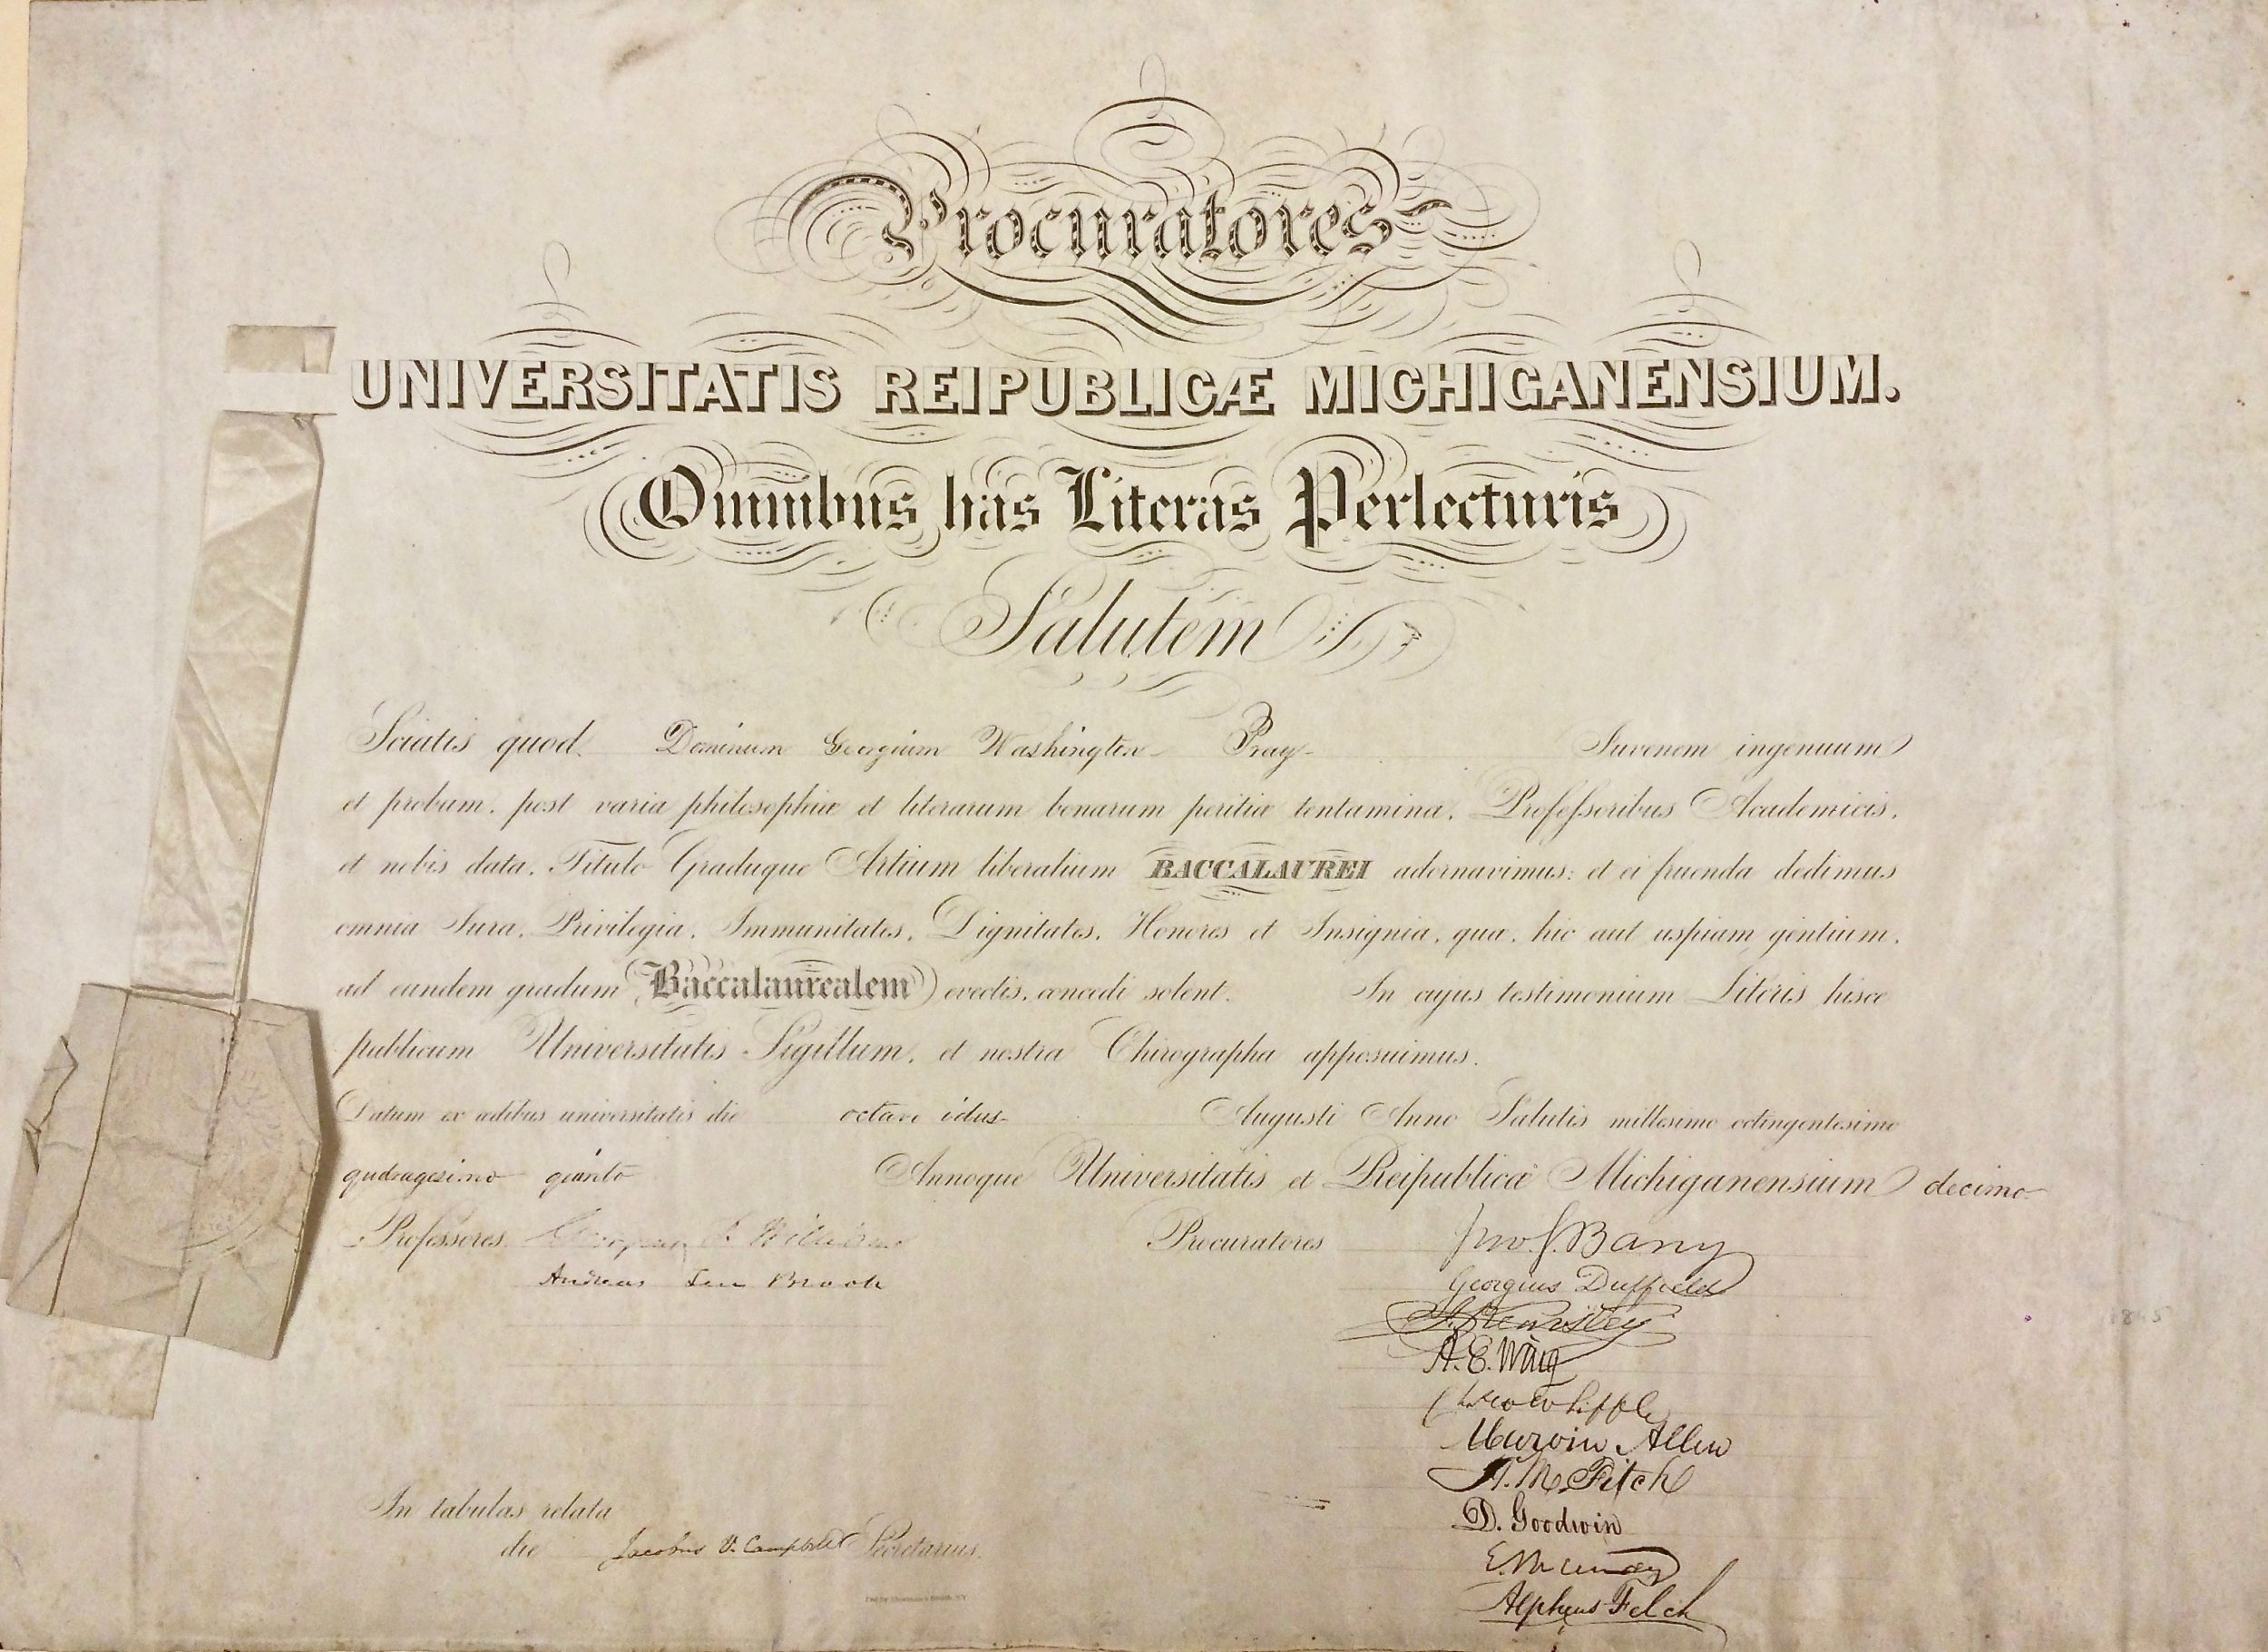 1845 diploma for George Washington Pray